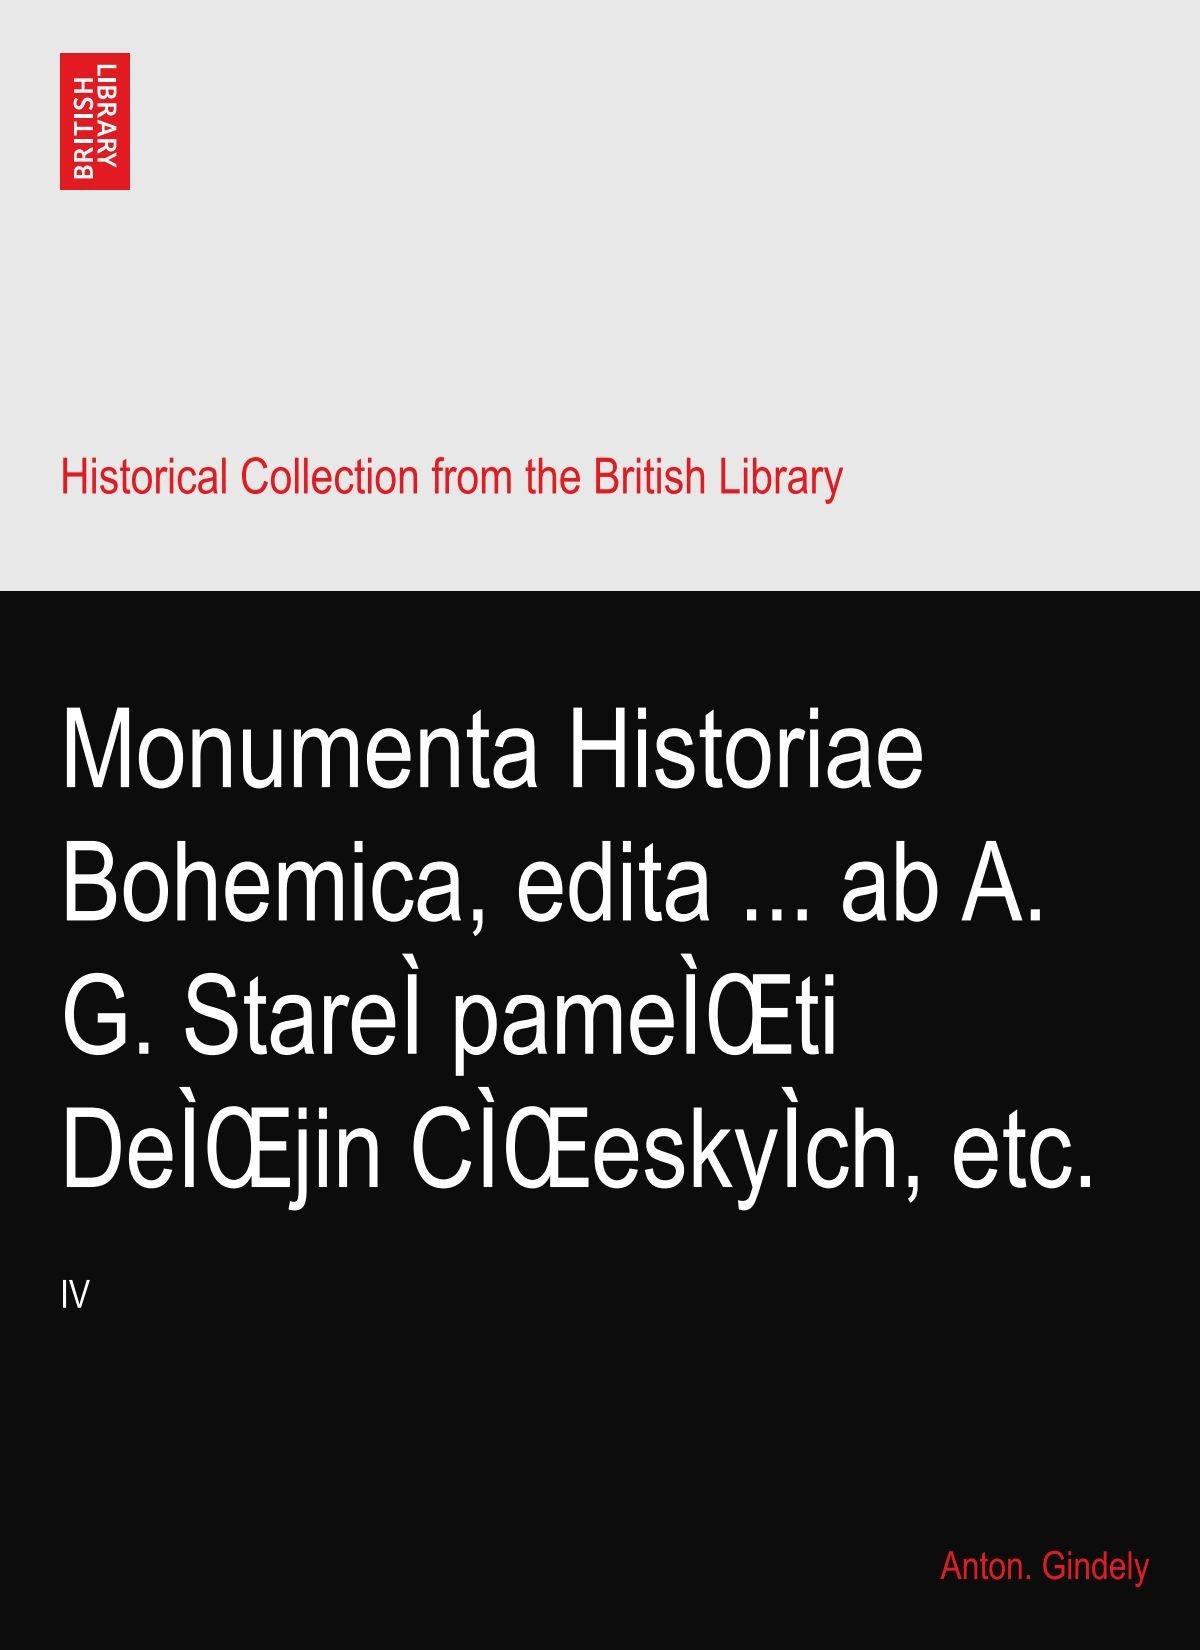 Monumenta Historiae Bohemica, edita ... ab A. G. StareÌ pameÌŒti DeÌŒjin CÌŒeskyÌch, etc.: IV PDF